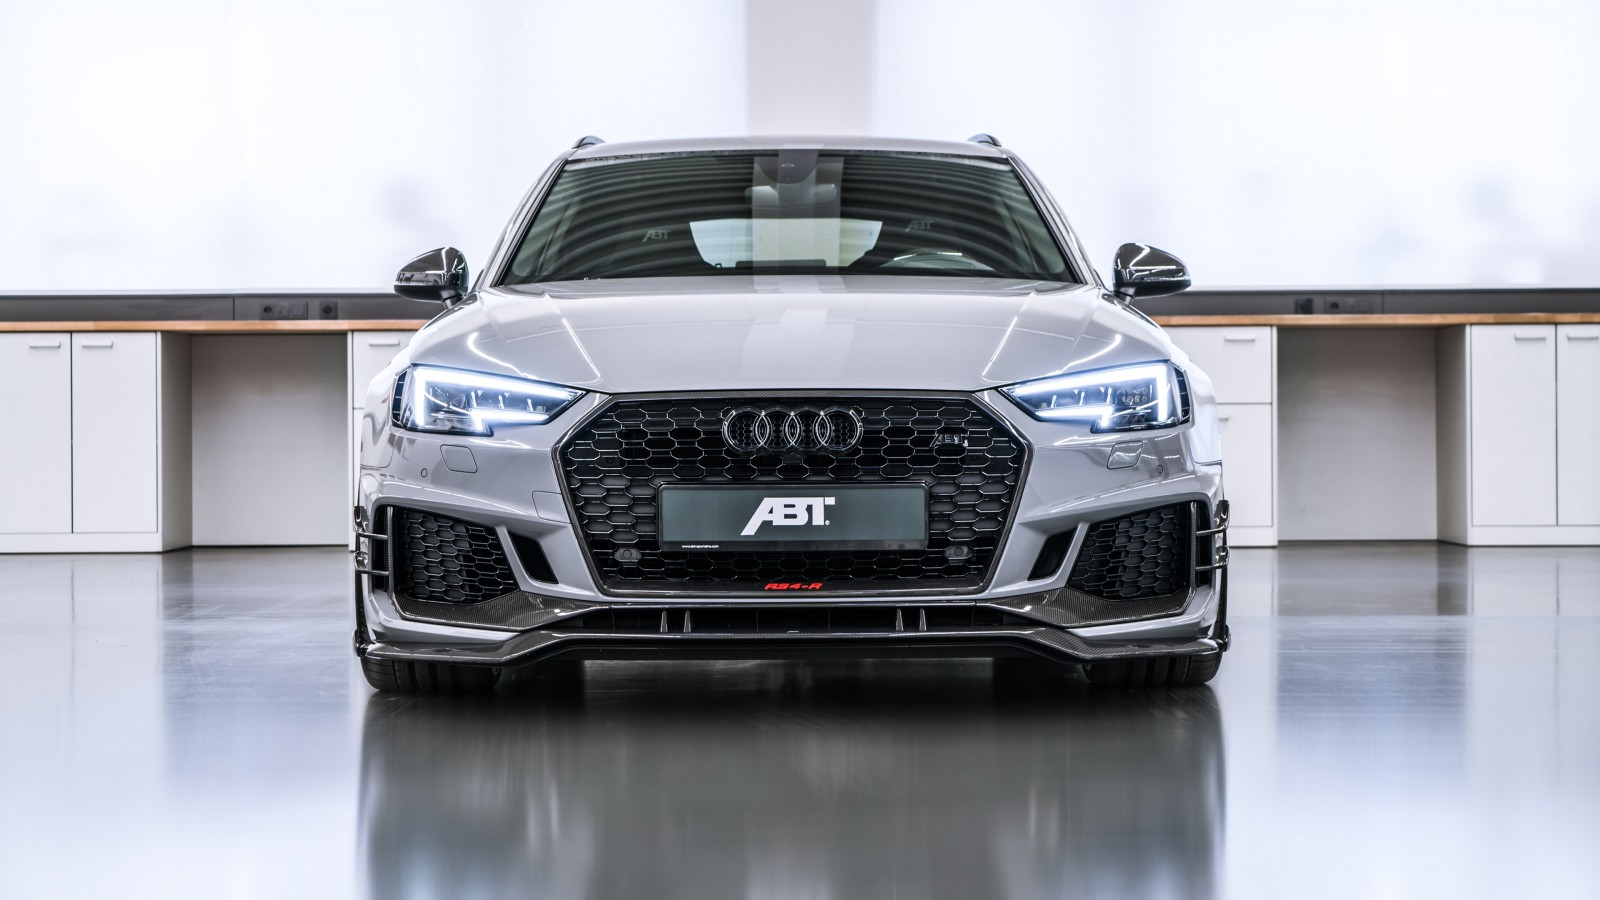 2018 Abt Audi Rs4 R Avant 4k Wallpaper Hd Car Wallpapers